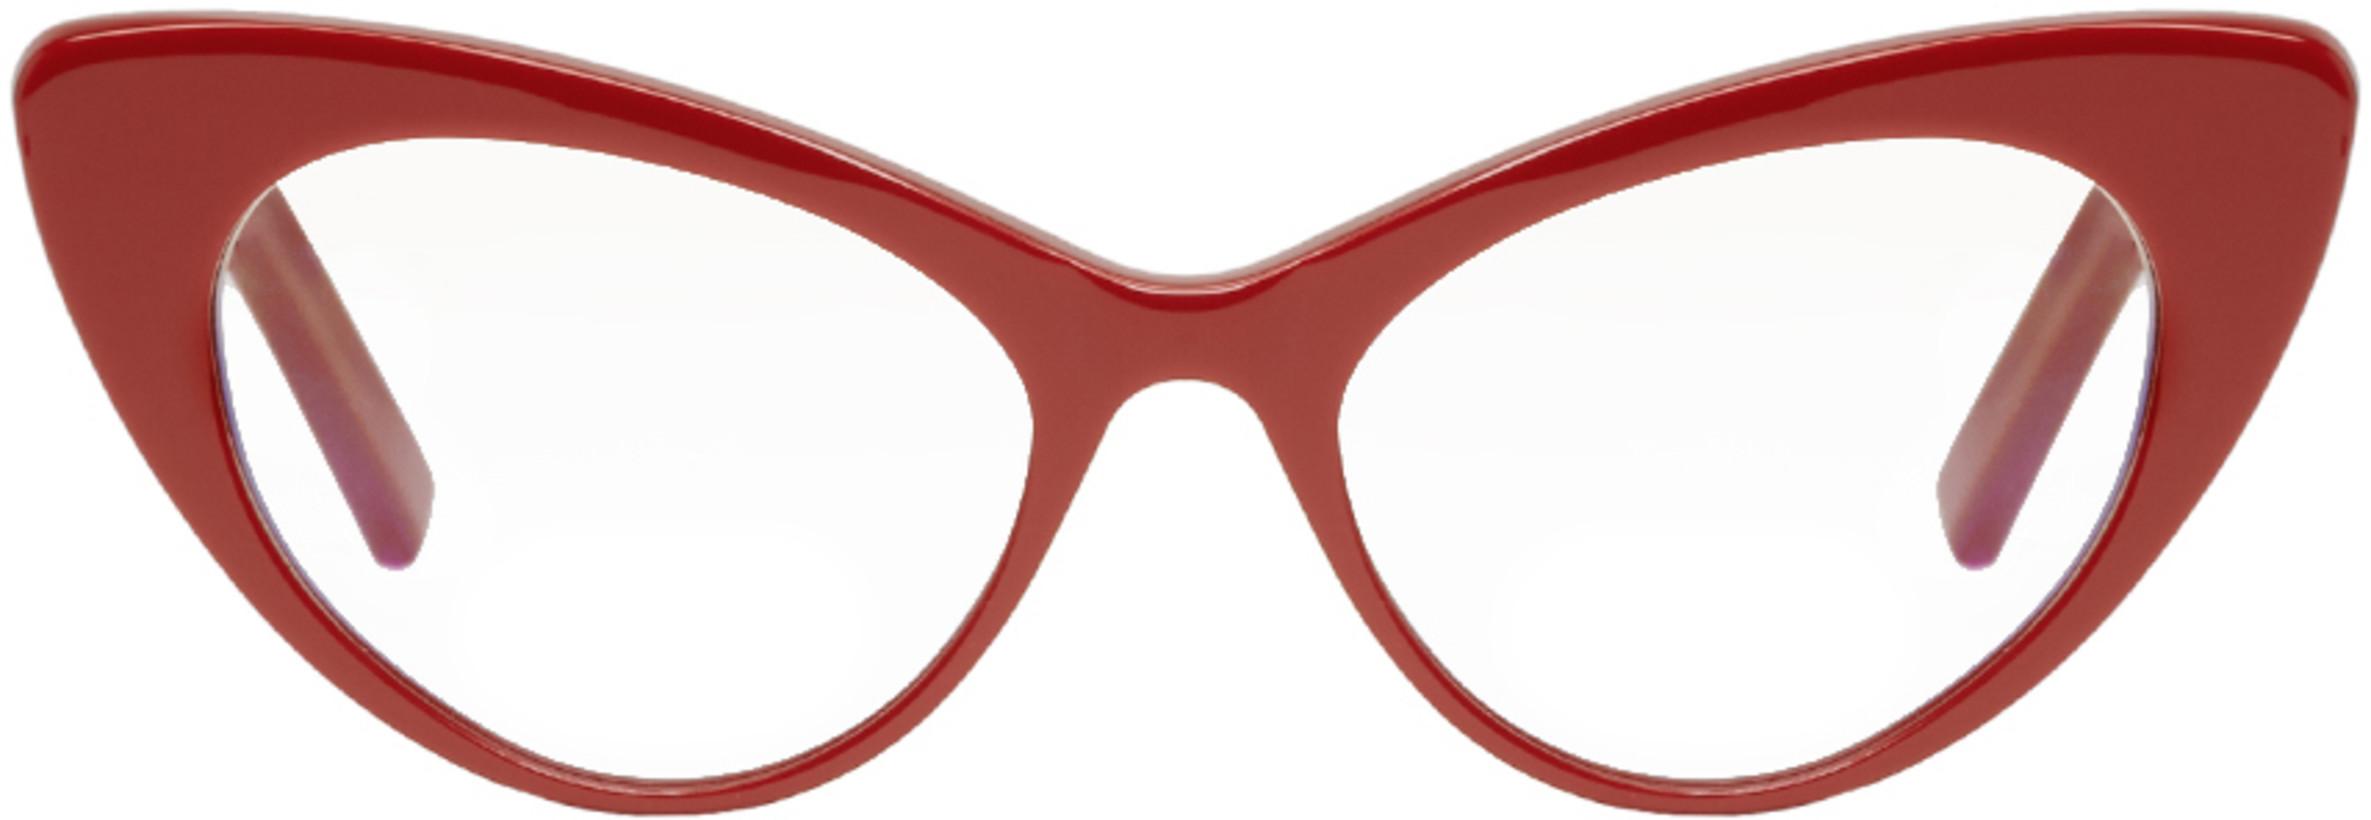 Saint Laurent Red Bold Cat Eye Glasses